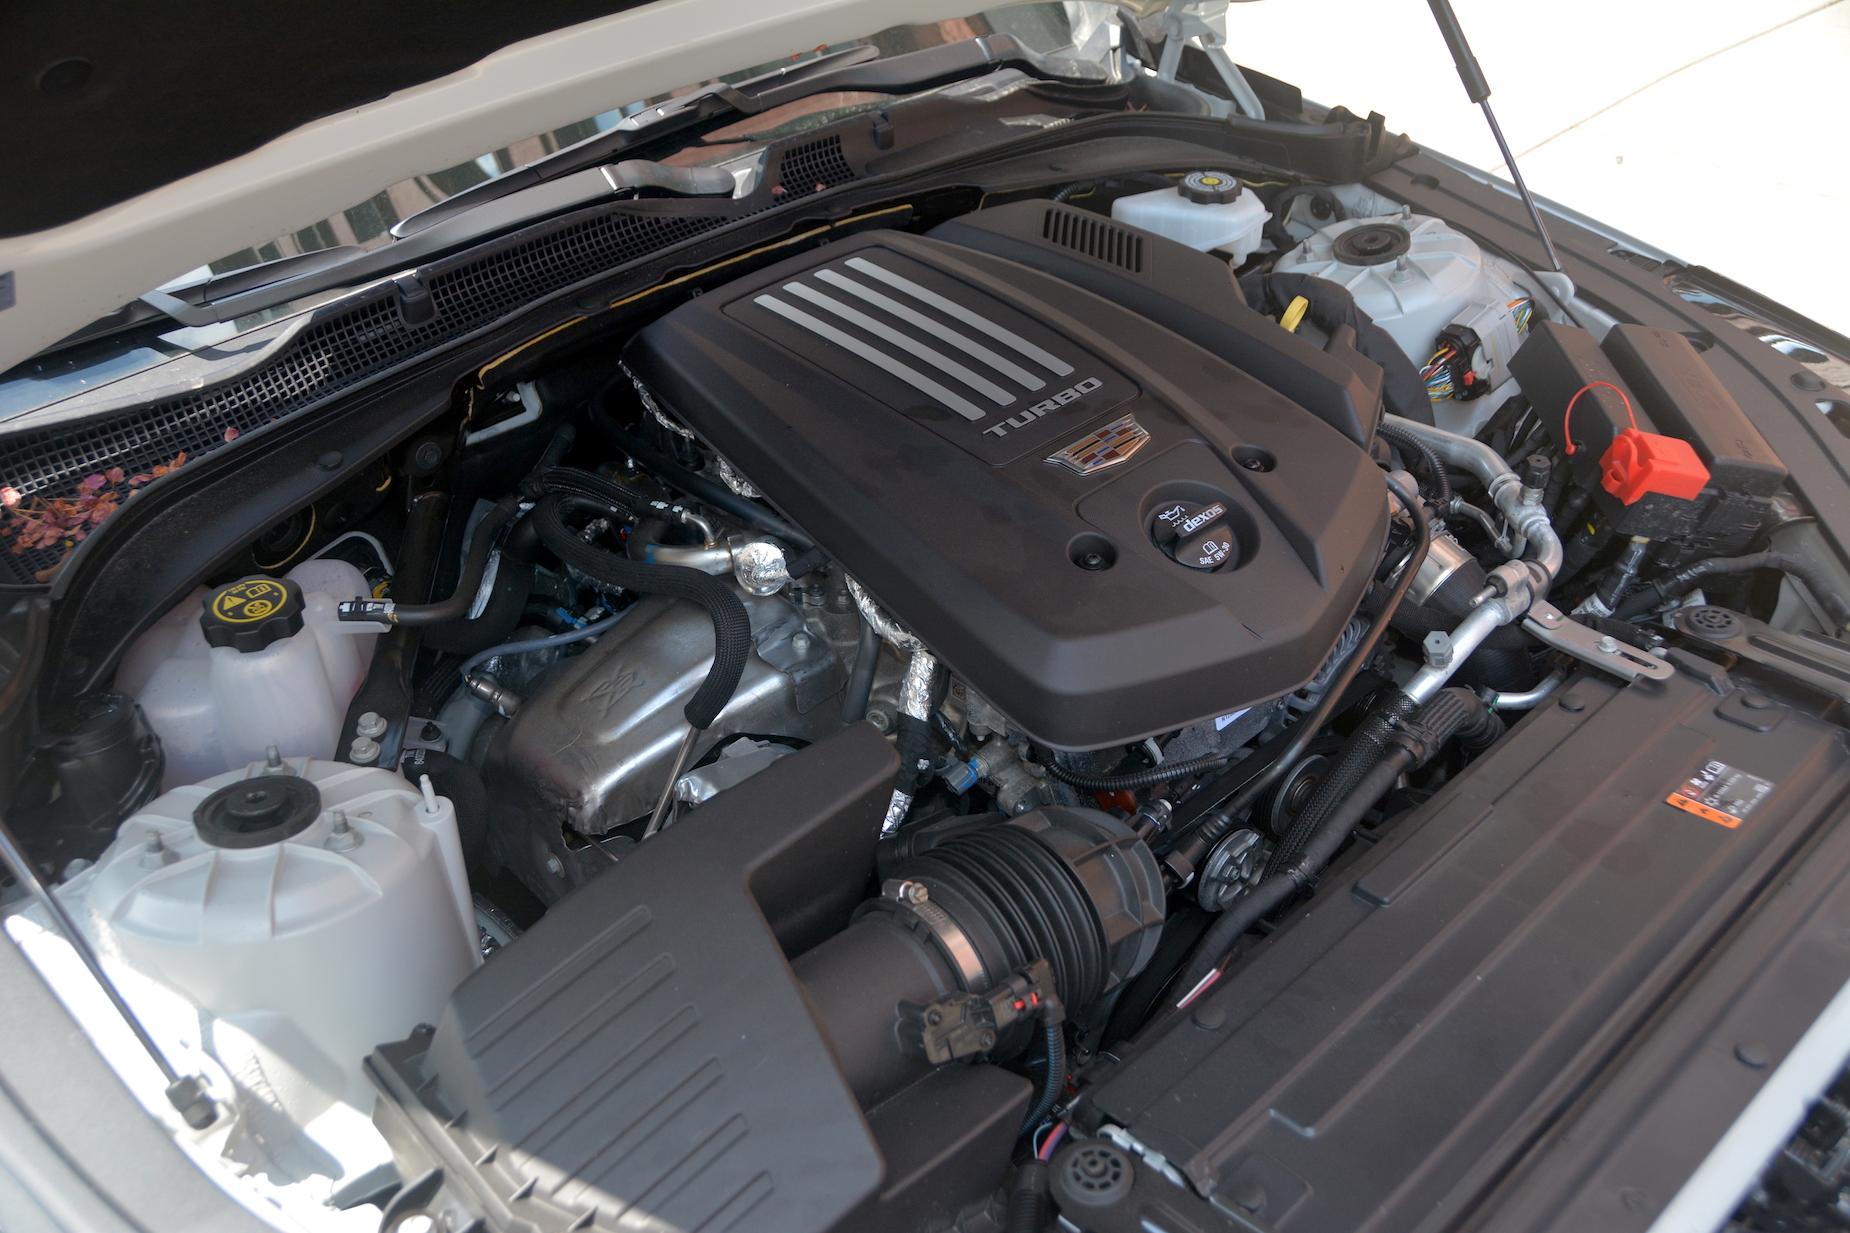 2021 Cadillac CT4-V engine